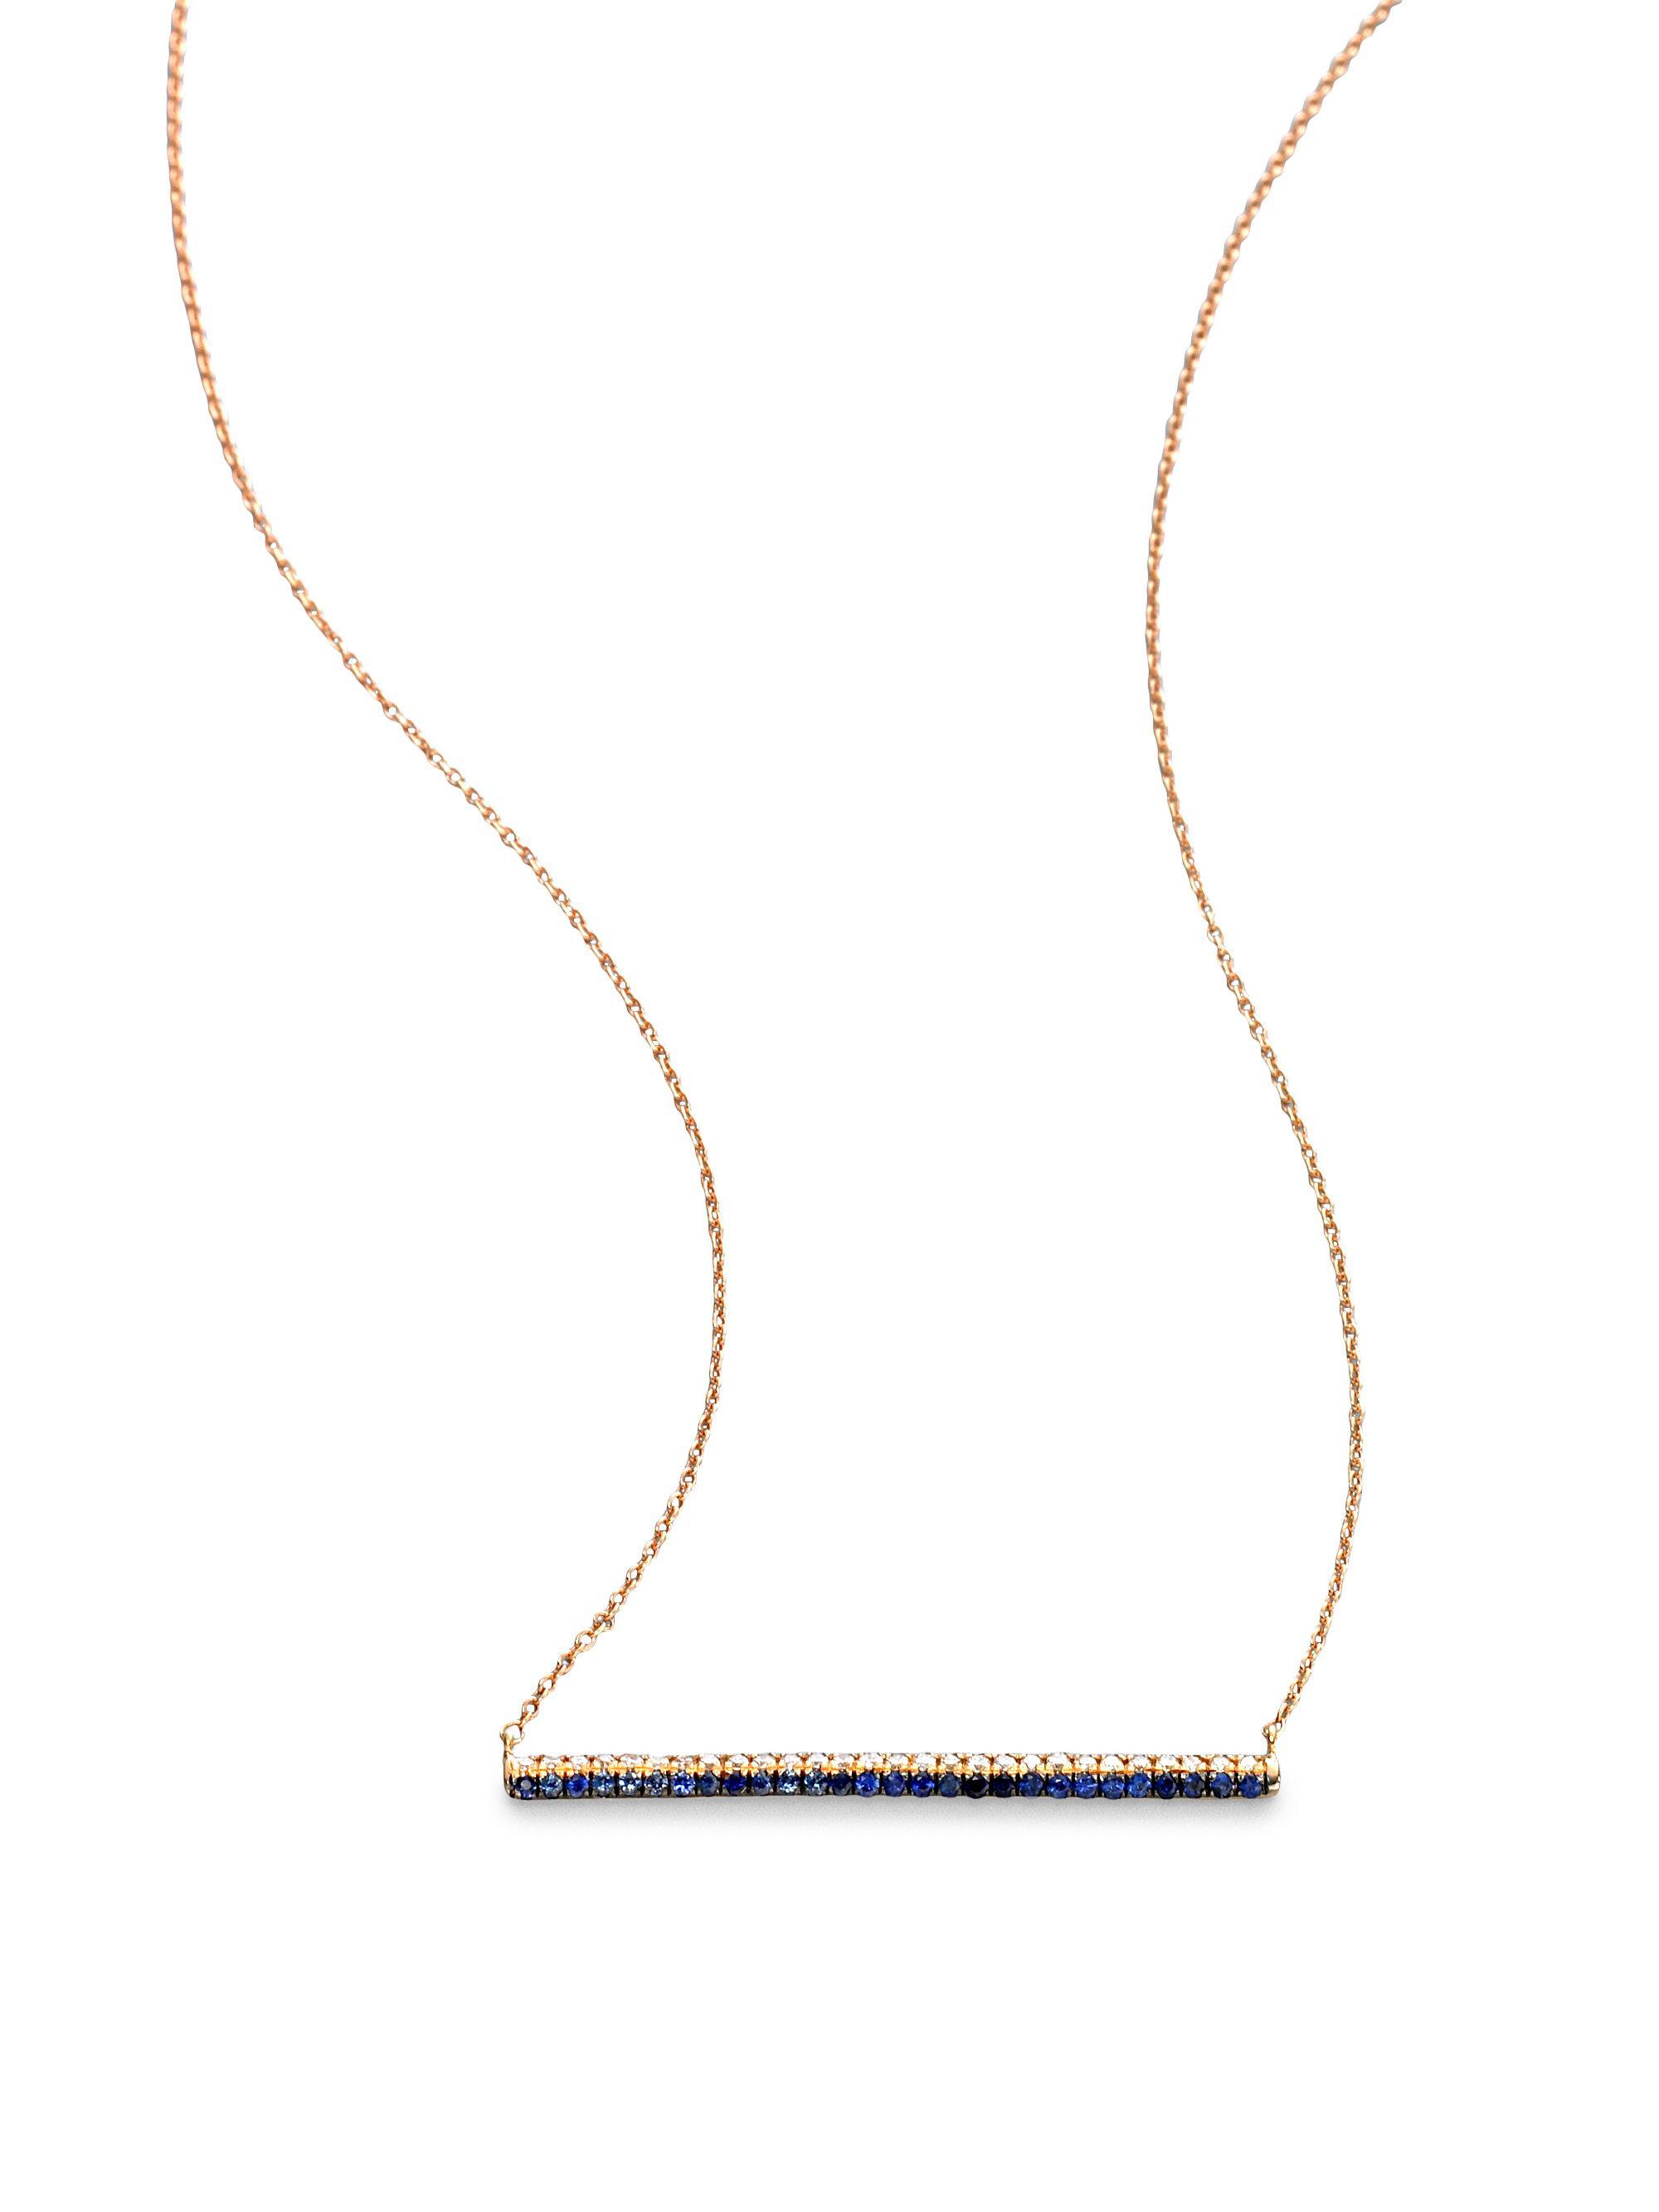 Diamond, sapphire & rose-gold Bolo necklace Diane Kordas